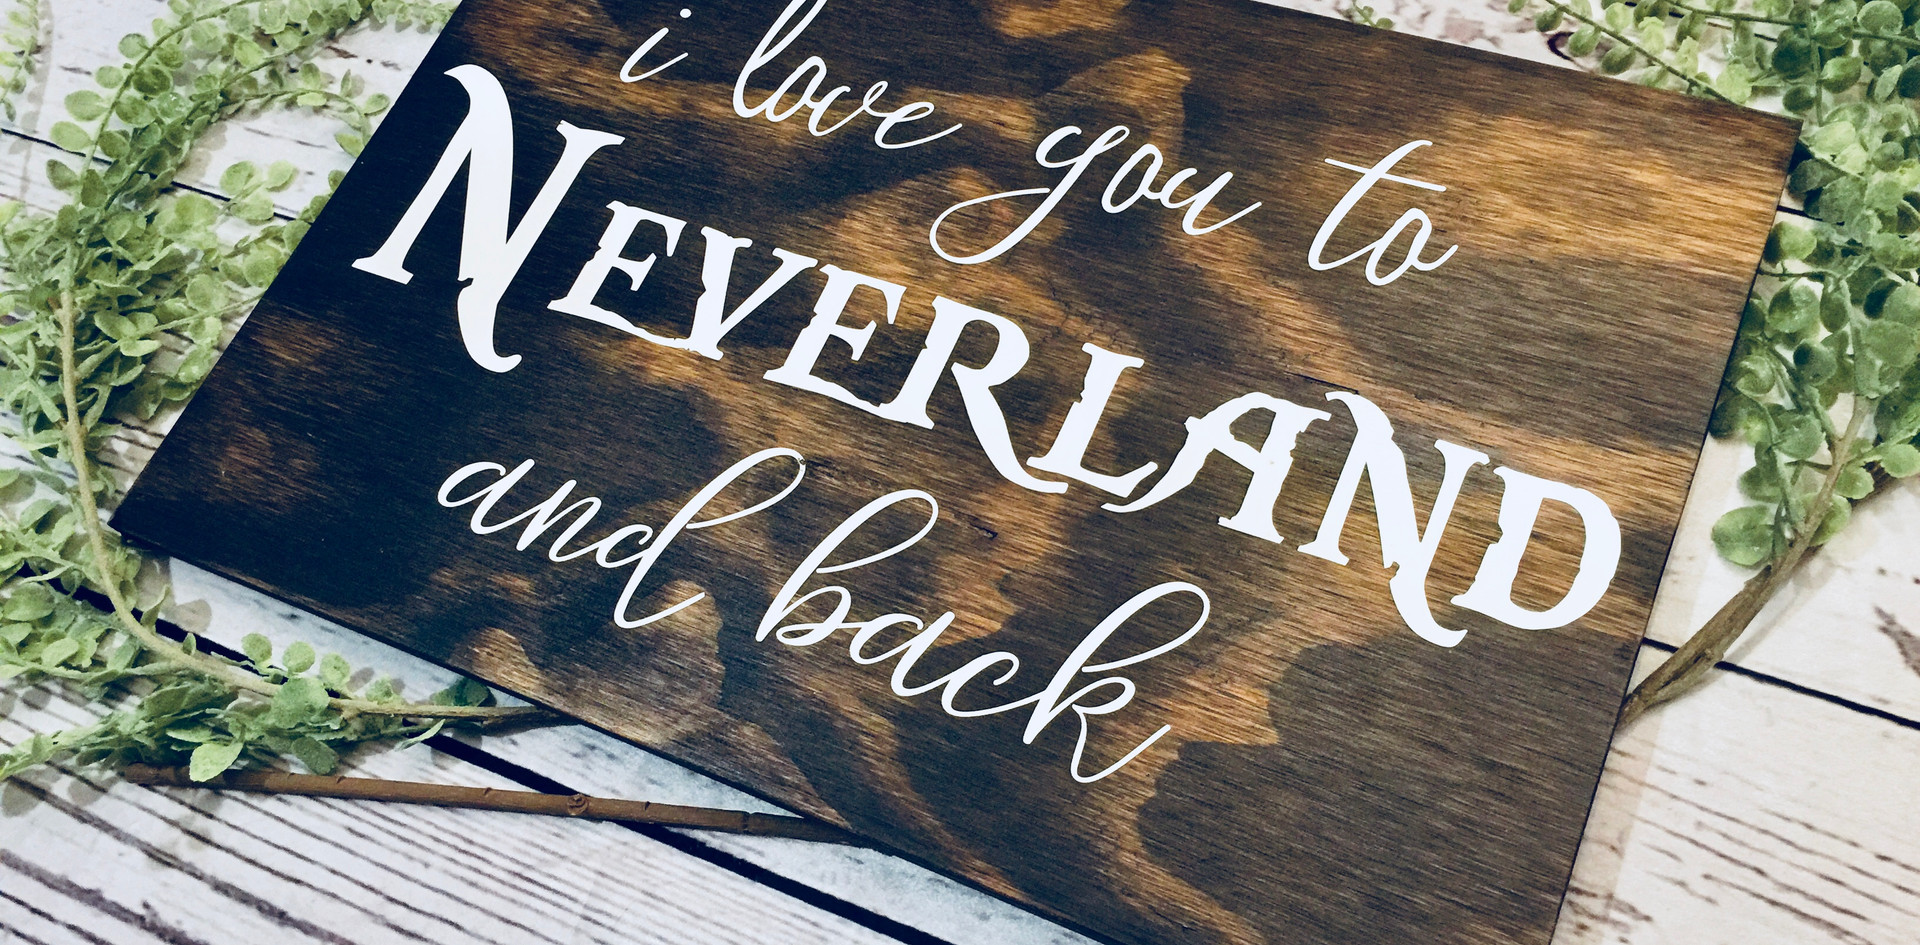 To Neverland & Back.